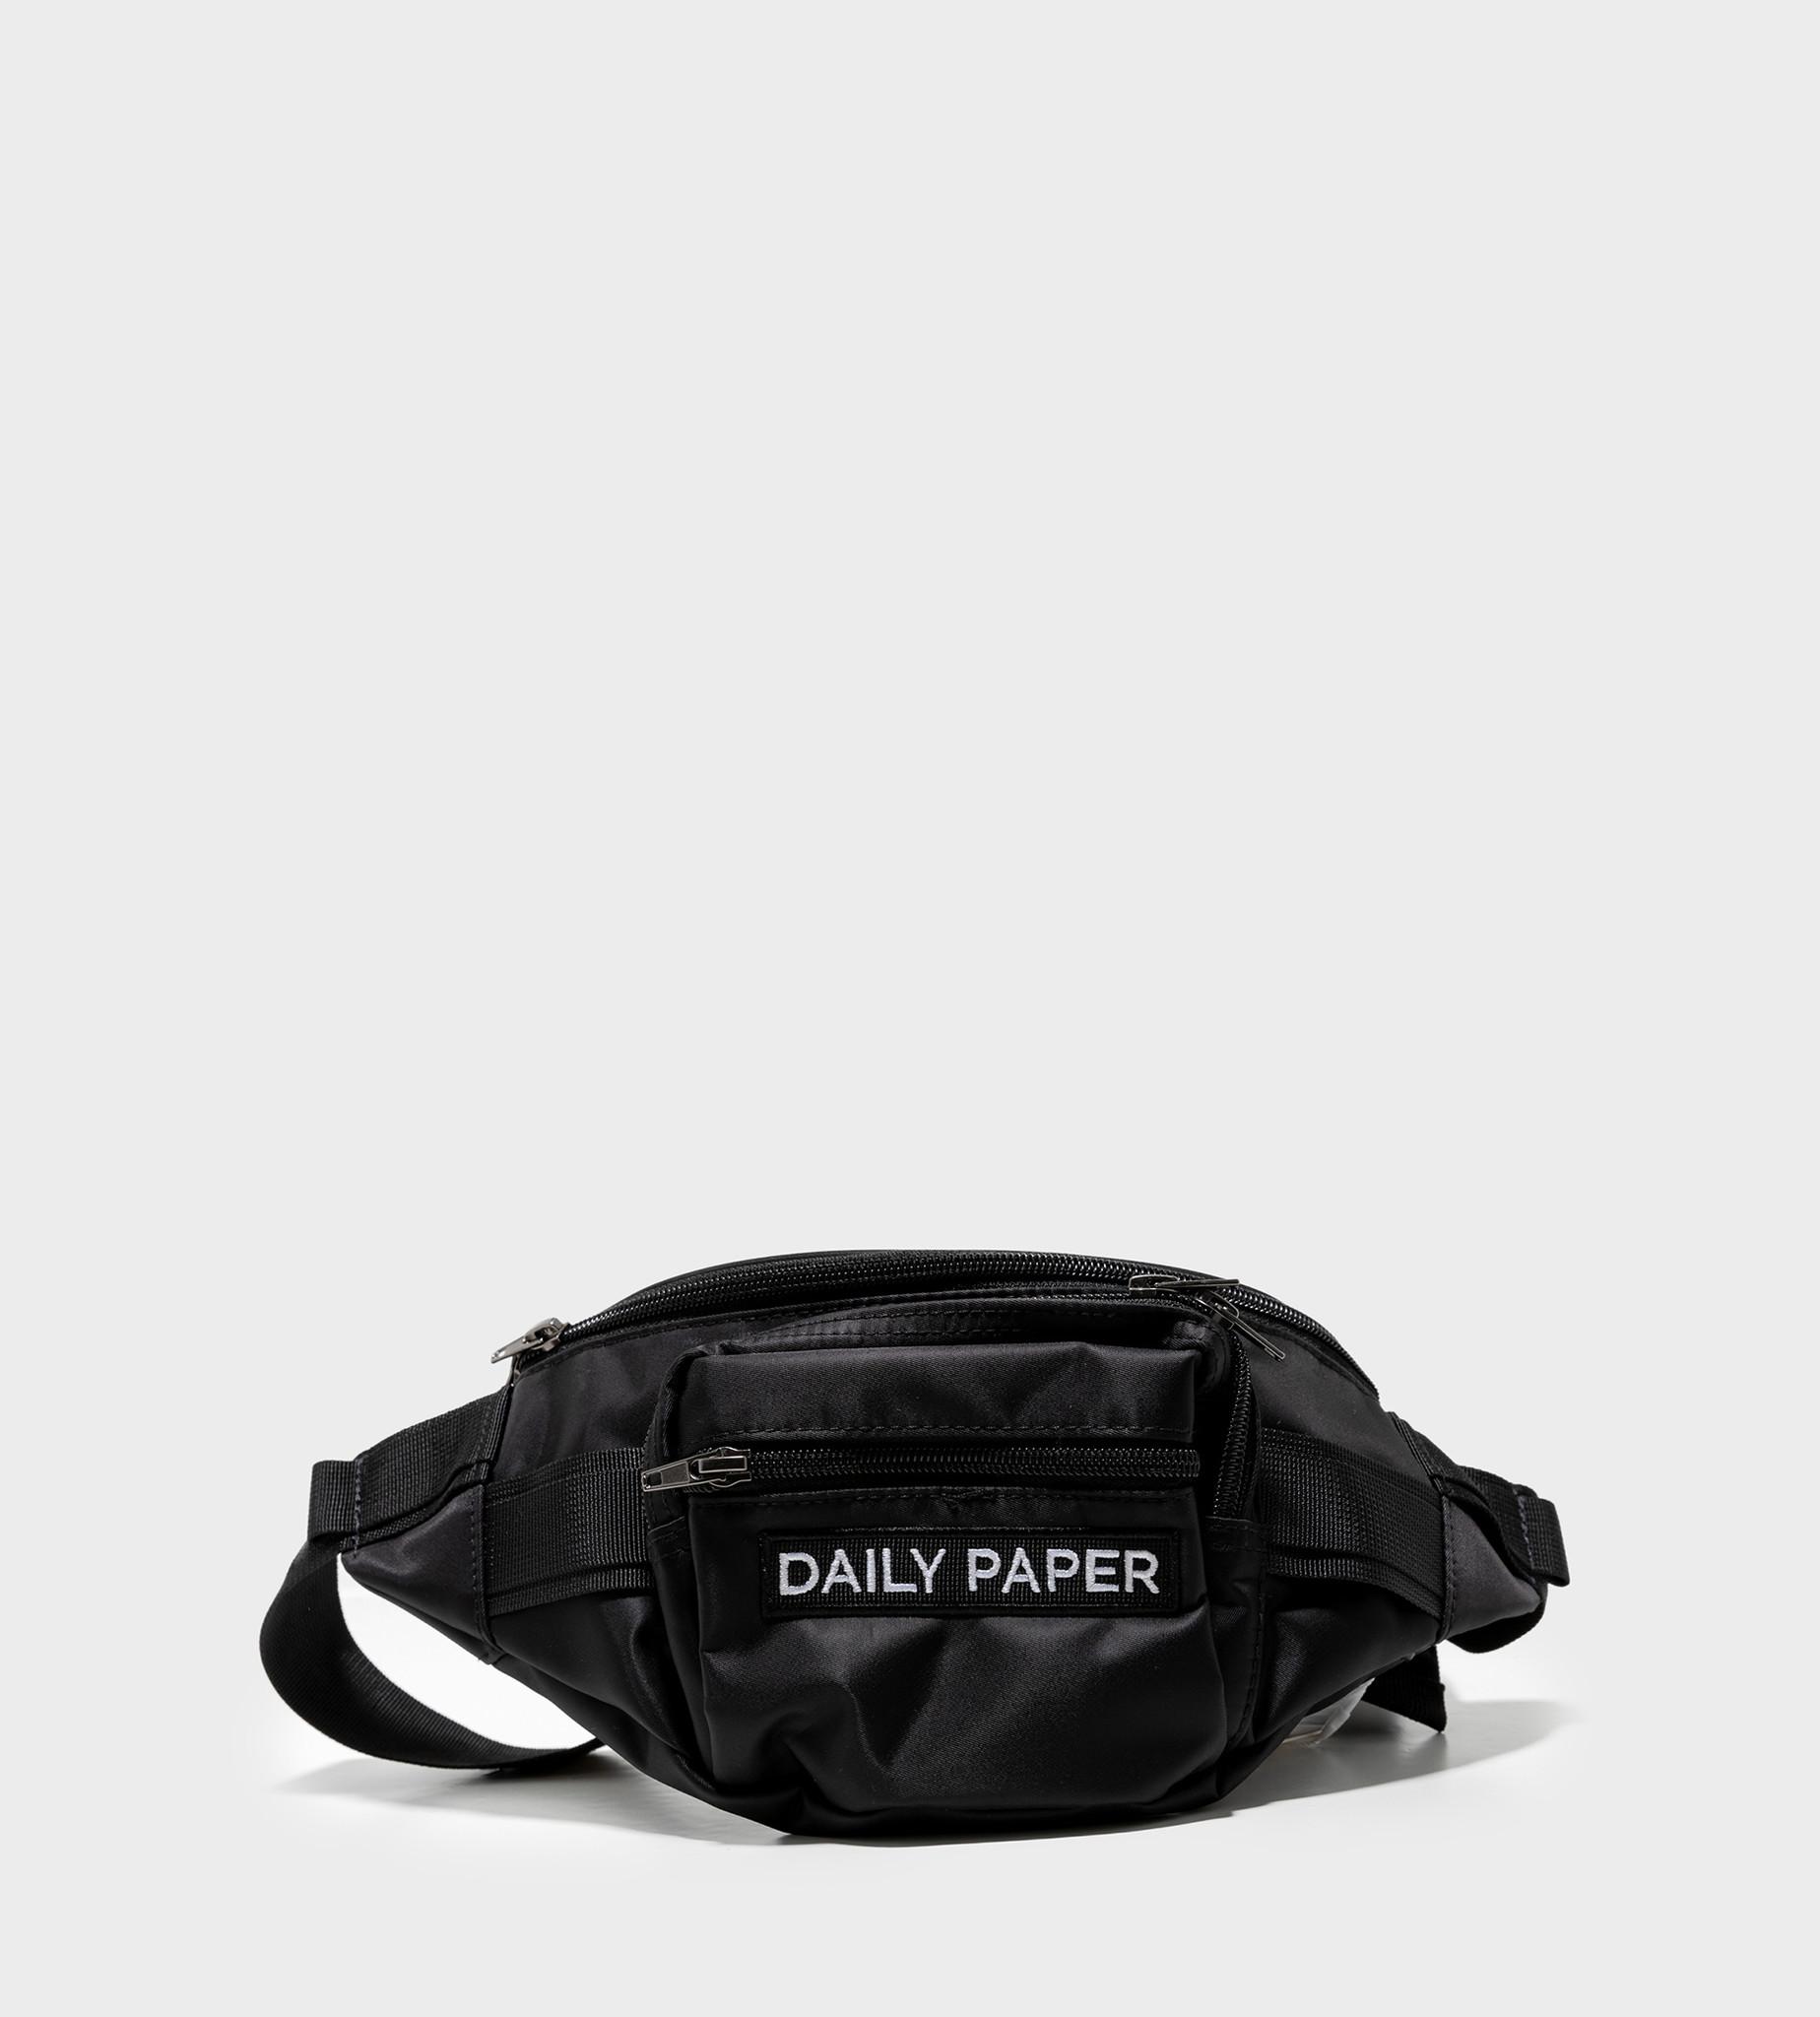 DAILY PAPER Fanny Bag Black